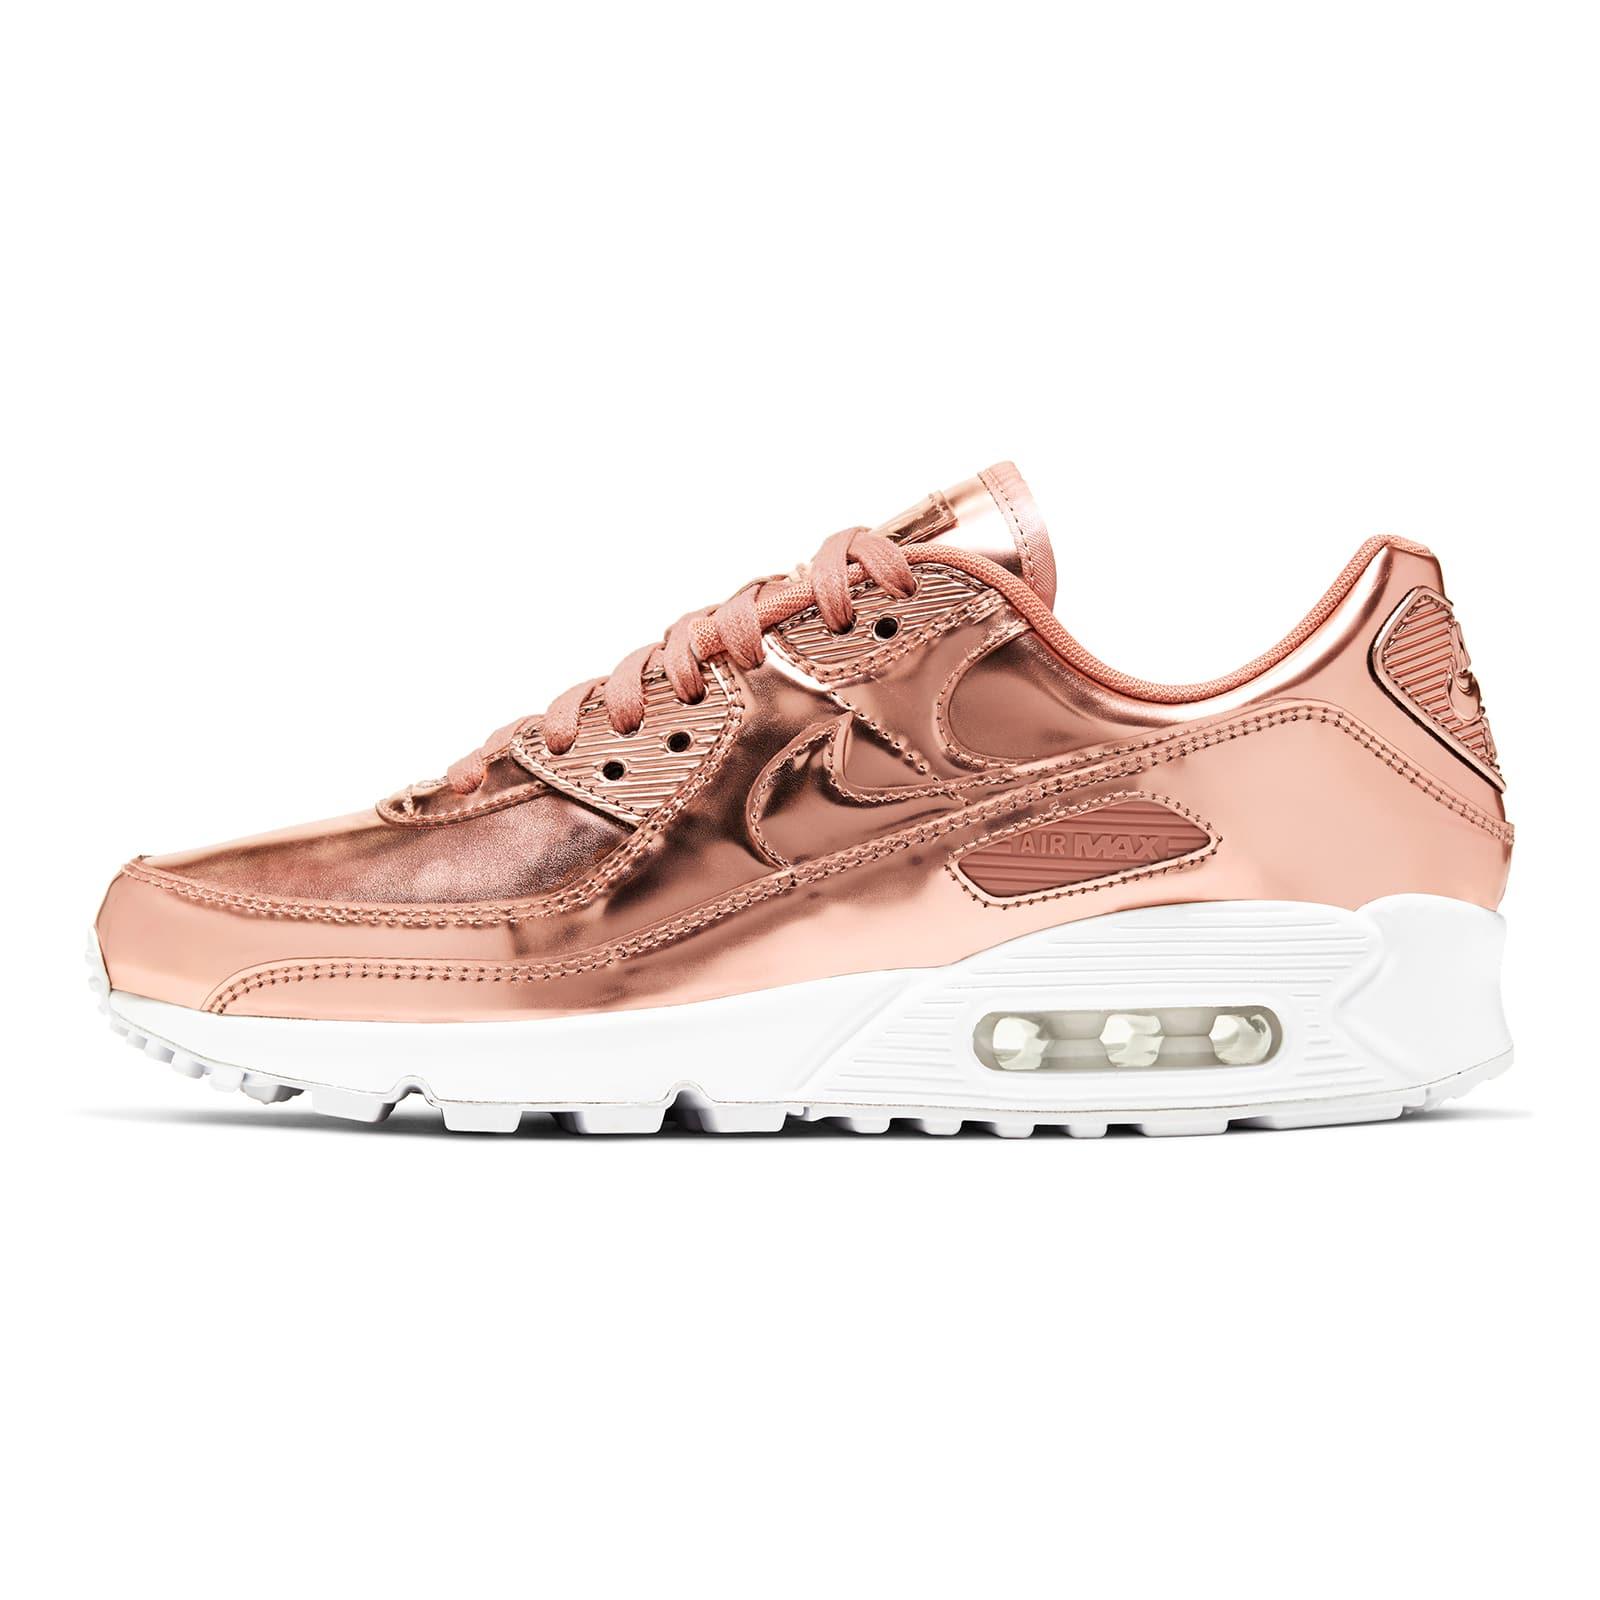 Розовые Air Max 90 Metallic